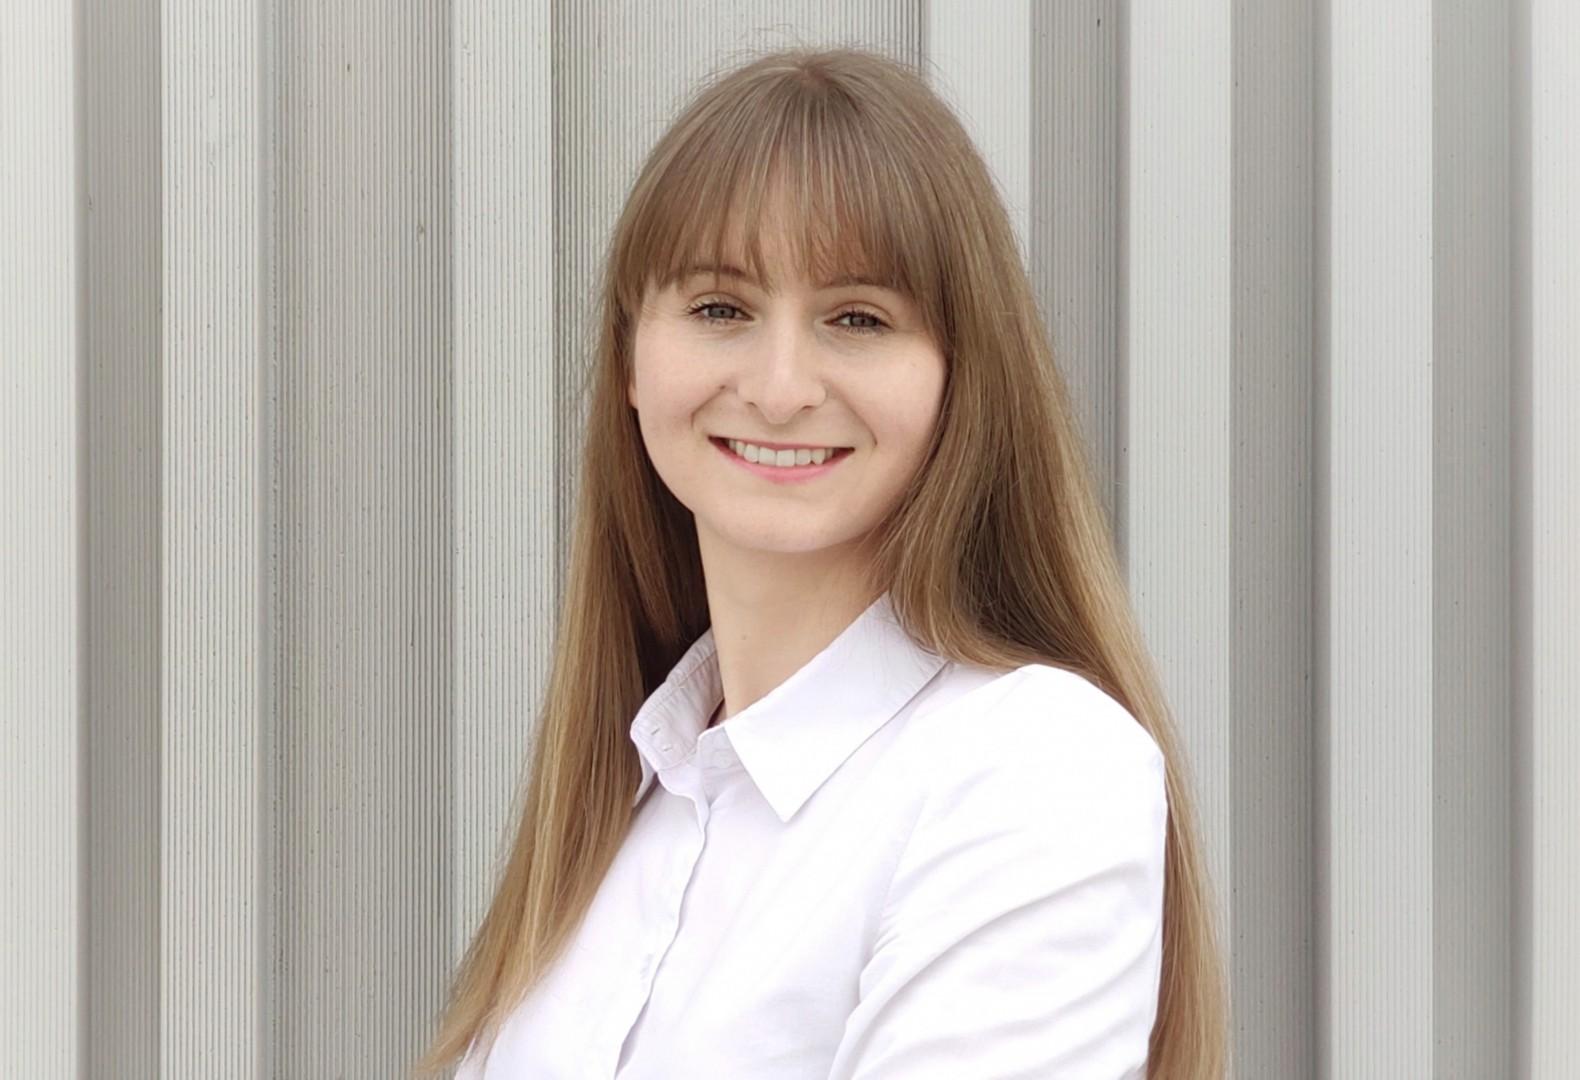 Veronika Wiesner, EY-Parthenon, Advertorial